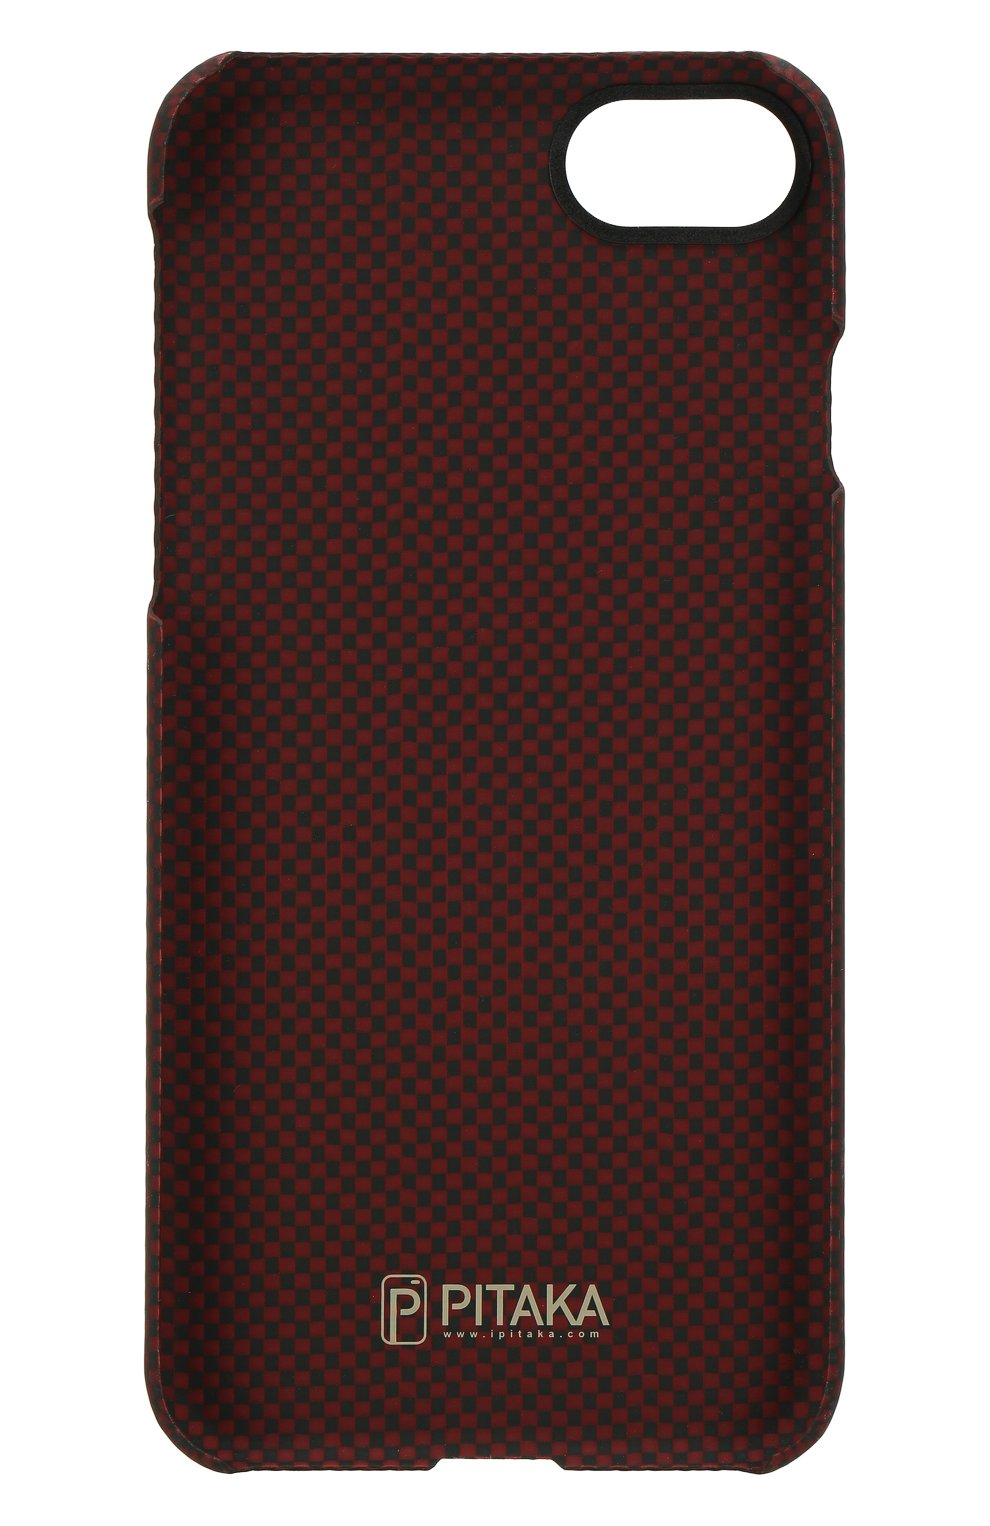 Мужской чехол для iphone 7/8 из кевларовой нити PITAKA красного цвета, арт. KI7004   Фото 2